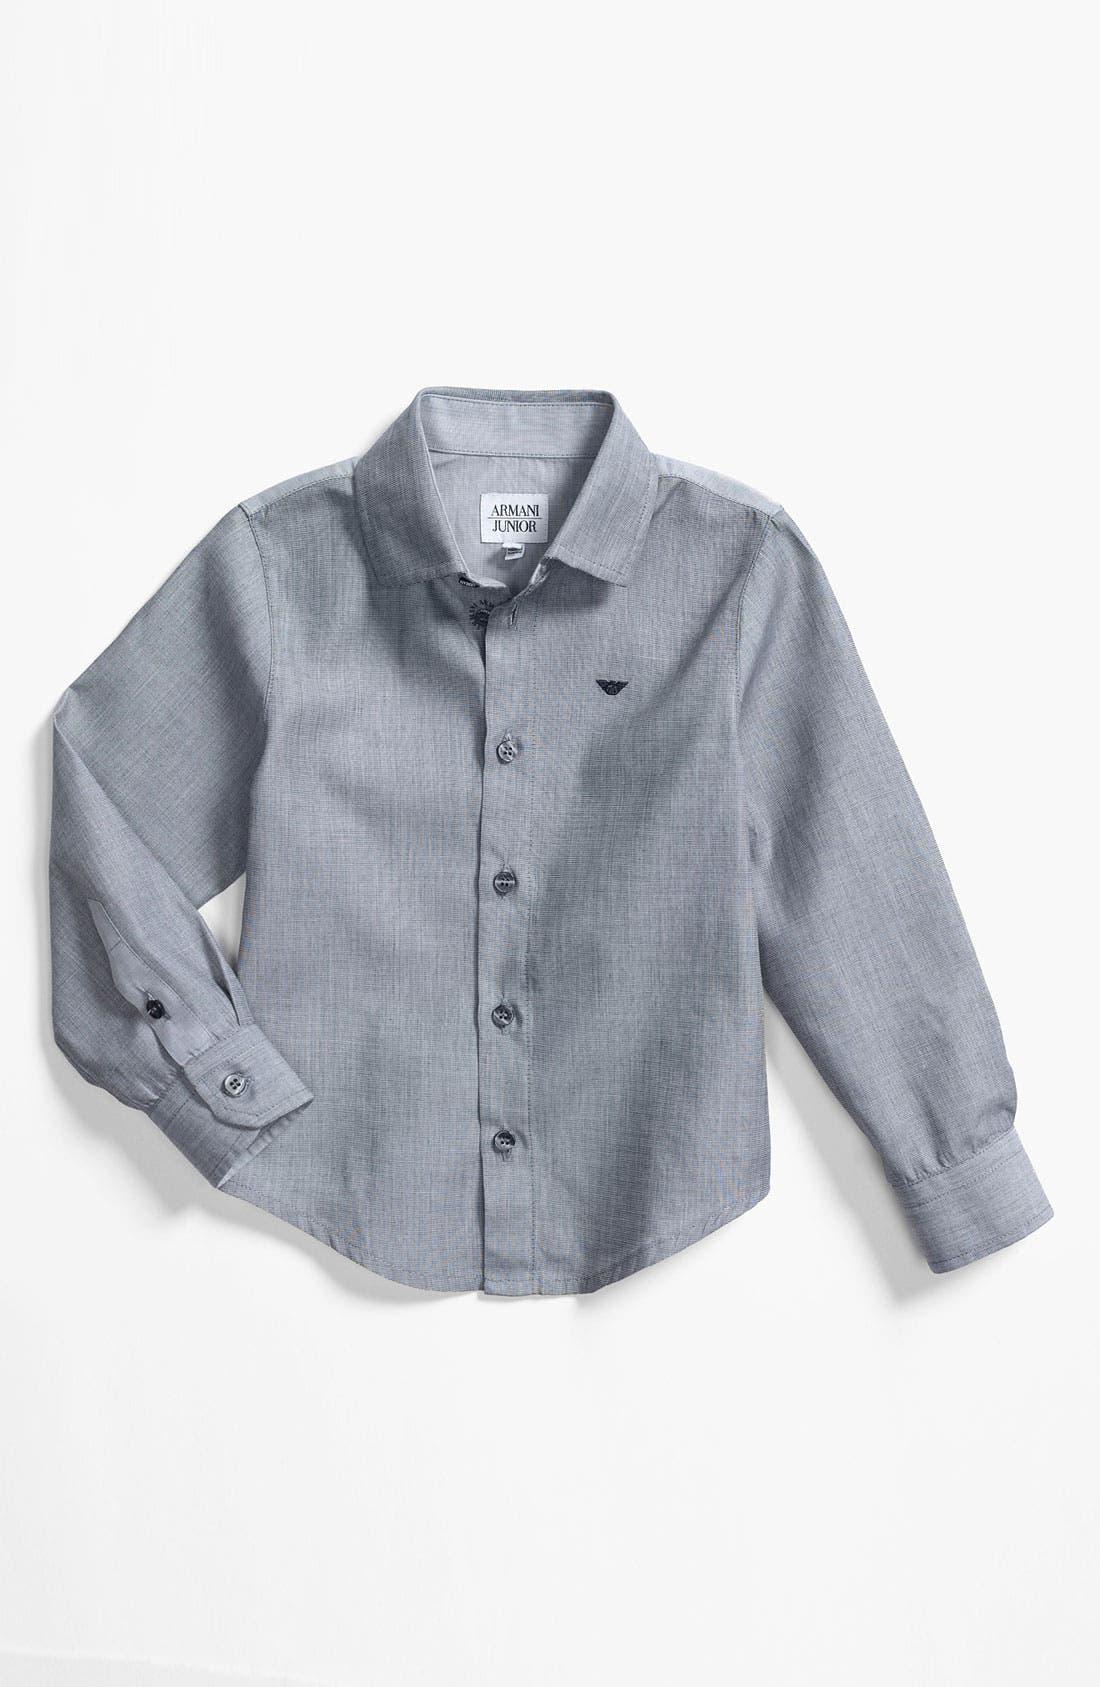 Main Image - Armani Junior Dress Shirt (Little Boys)